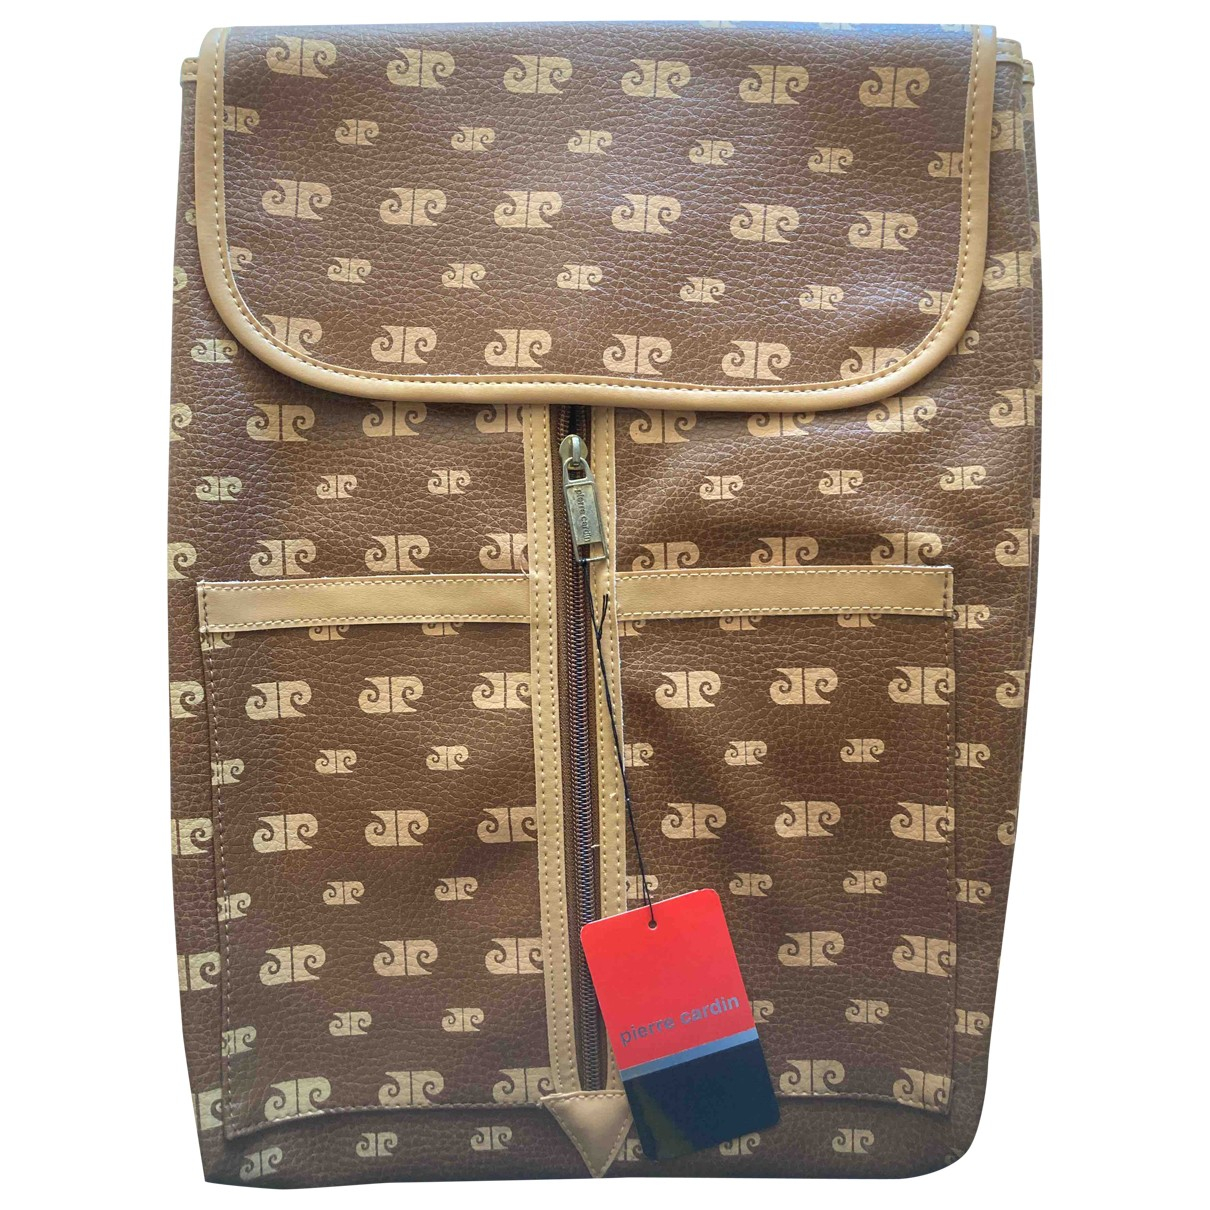 Pierre Cardin \N Small bag, wallet & cases for Men \N